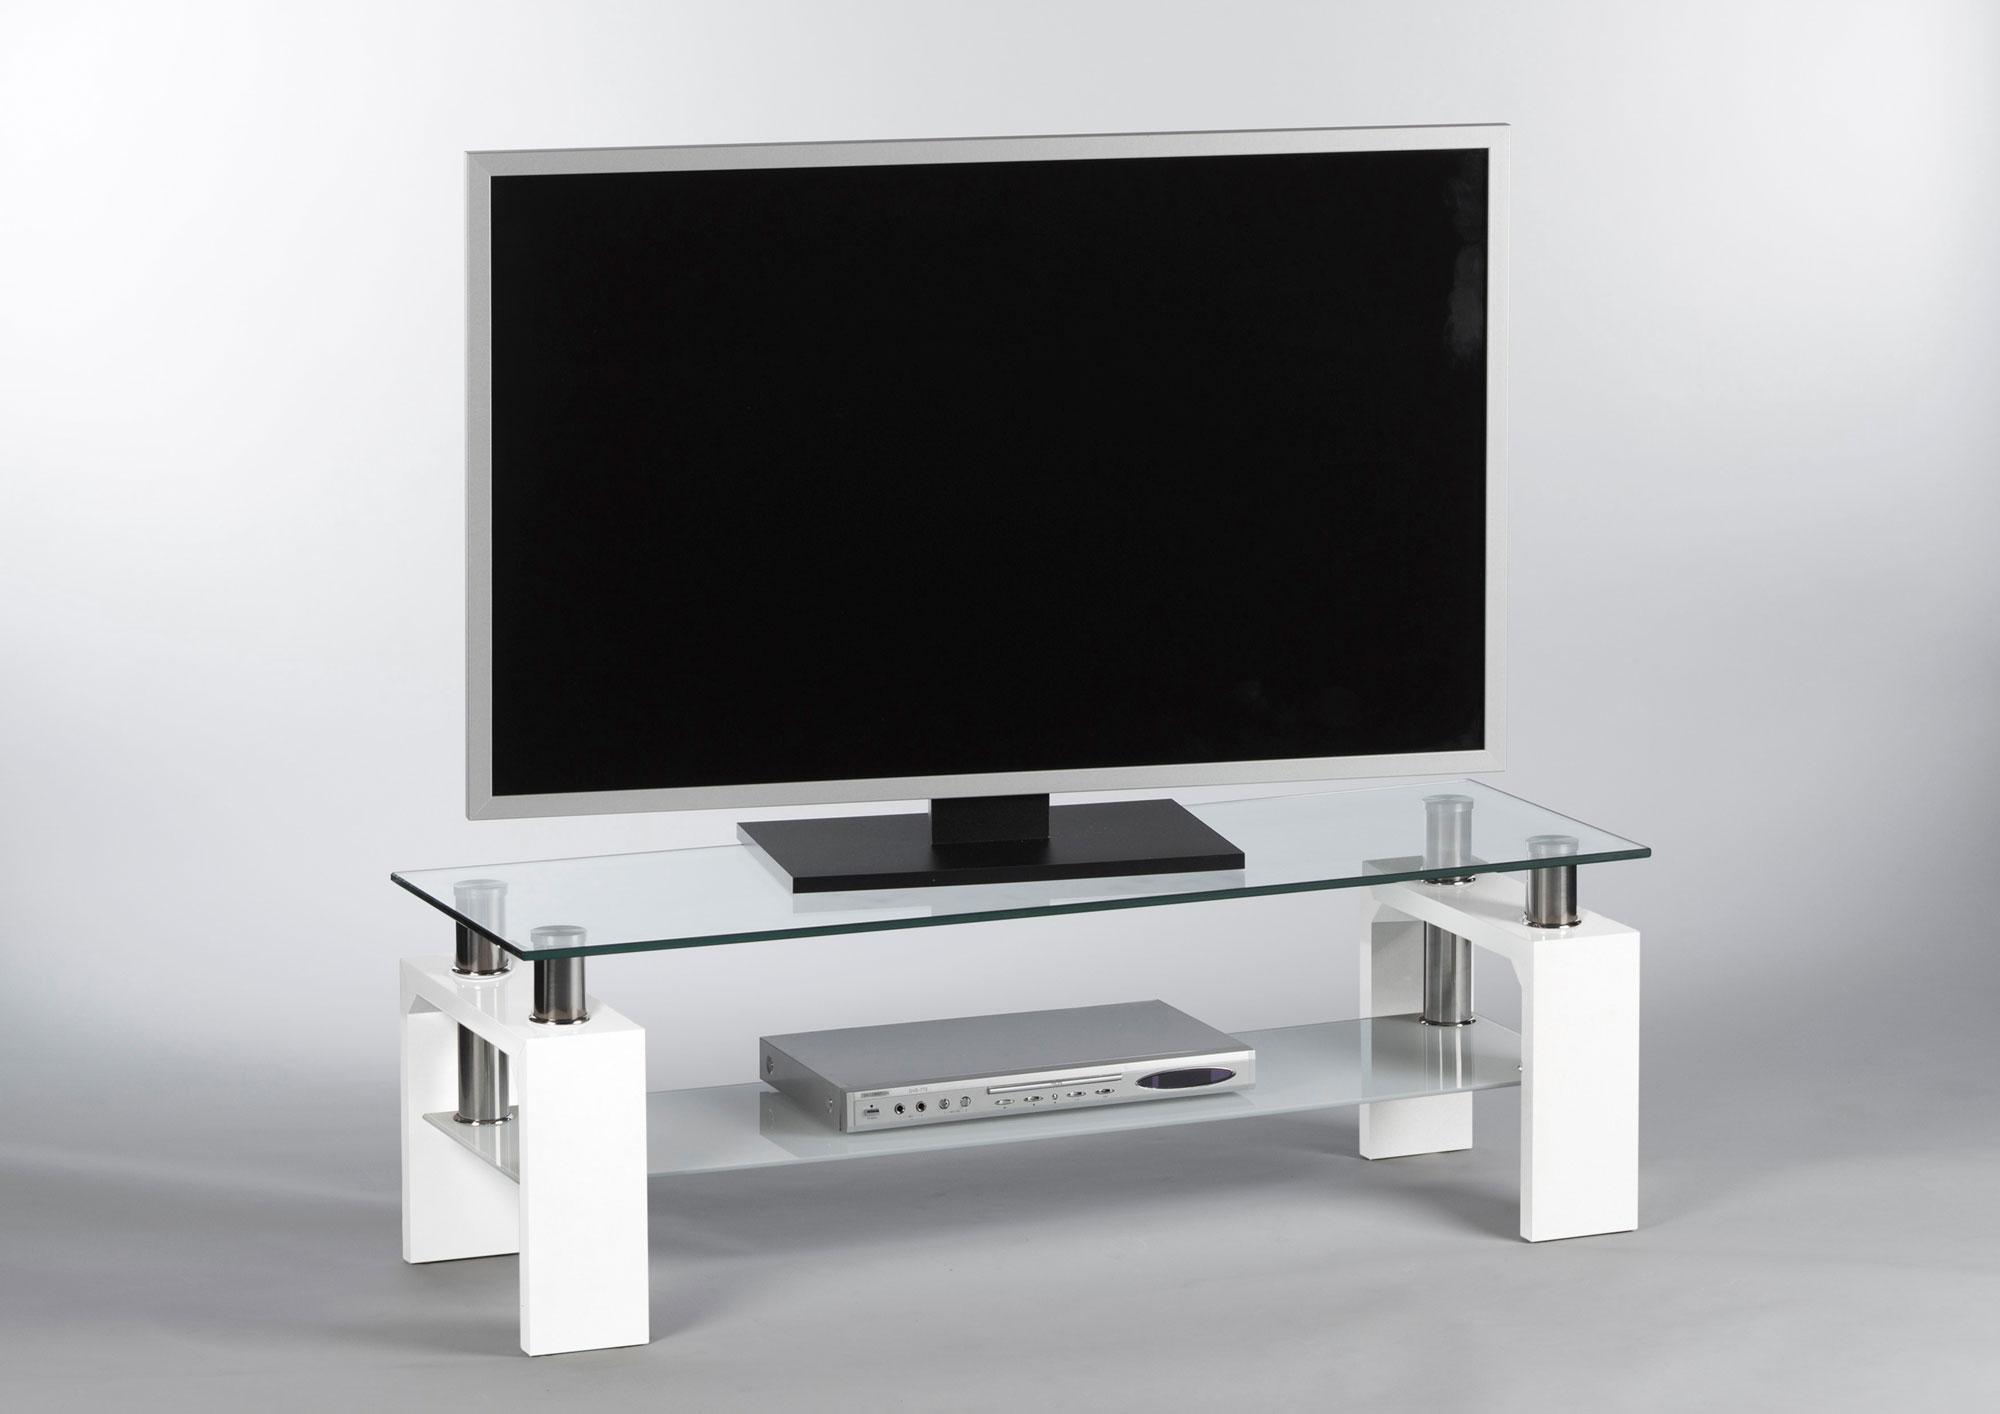 lowboard tv board fernsehschrank tv rack hochglanz wei lack glanz glas 32854 ebay. Black Bedroom Furniture Sets. Home Design Ideas